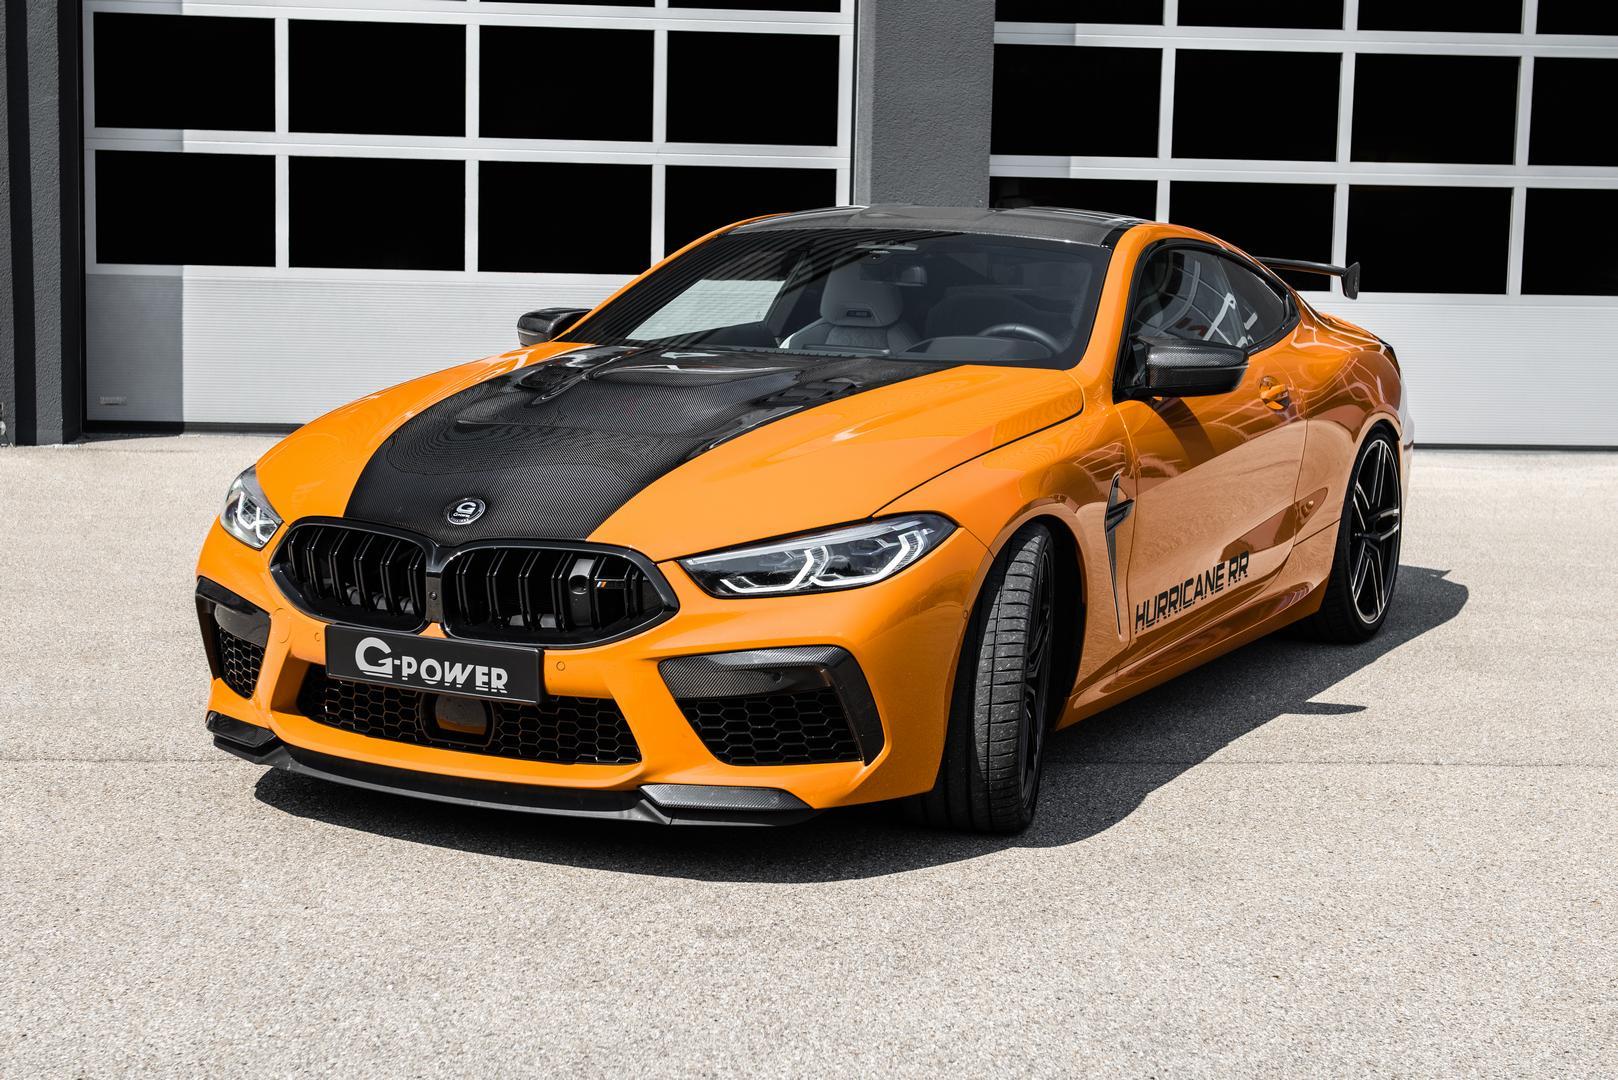 G-Power BMW M8 Hurricane RR price